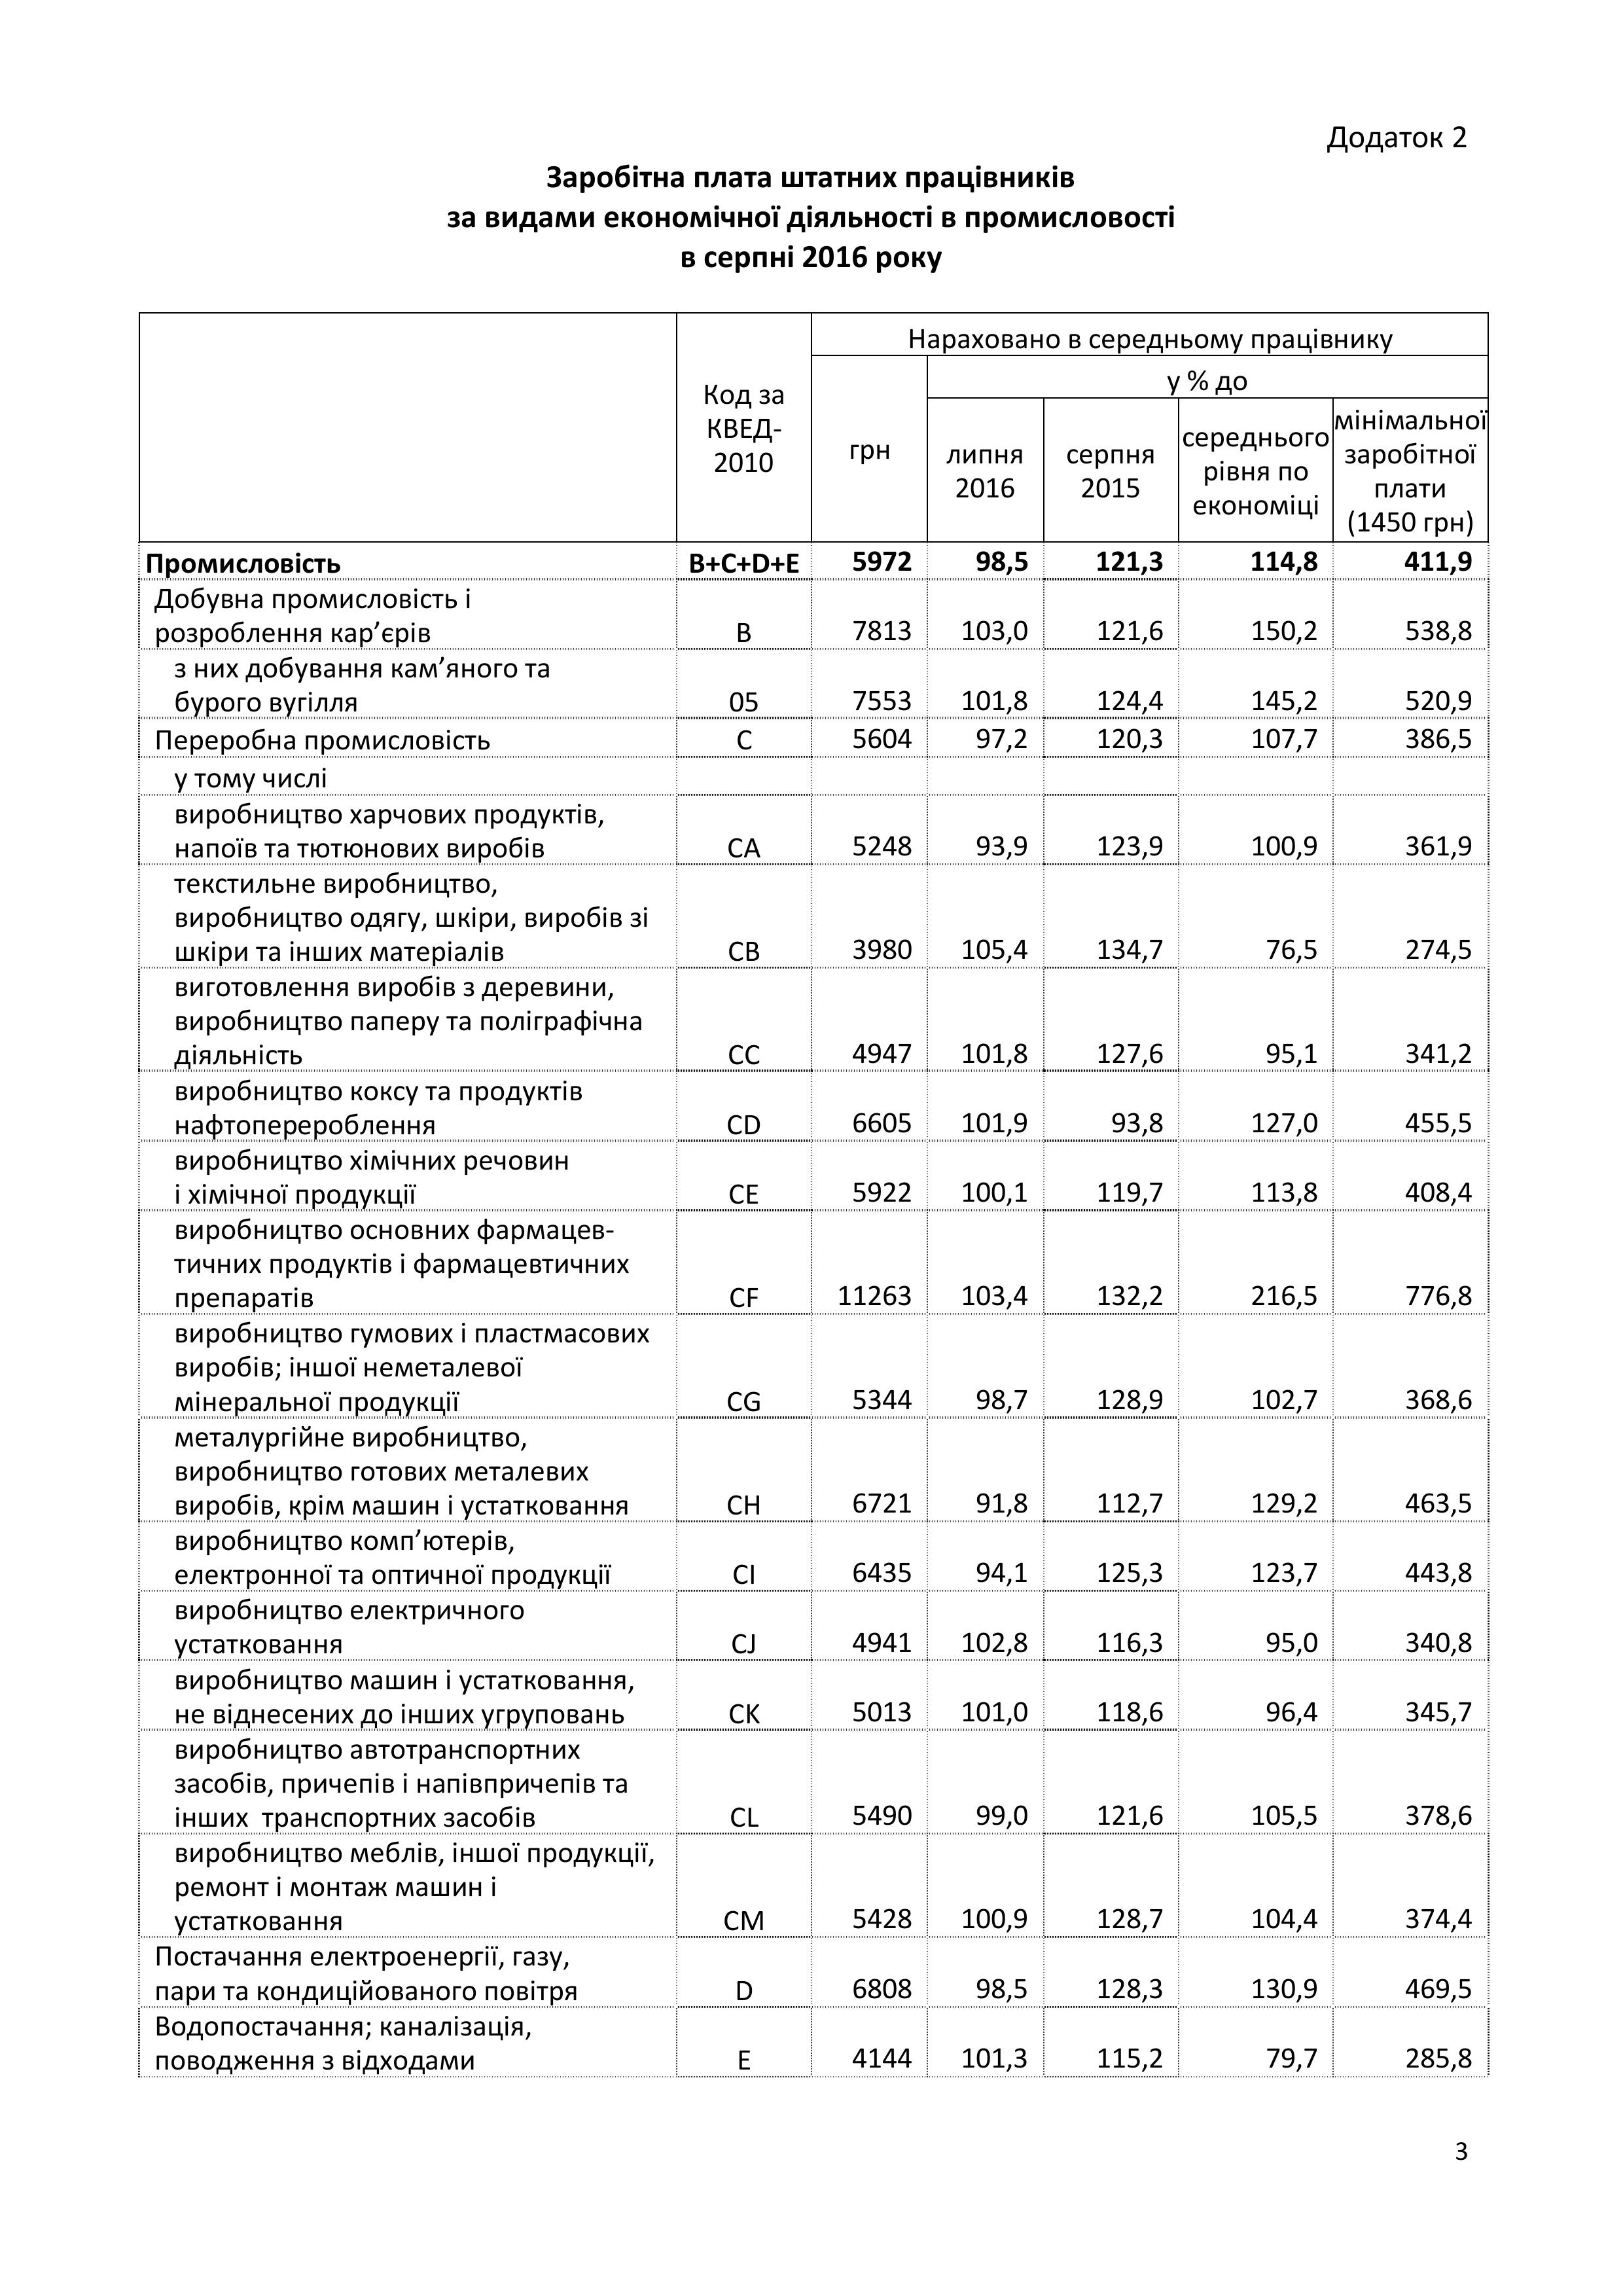 Реальна зарплата українців за рік зросла на 15% - фото 3